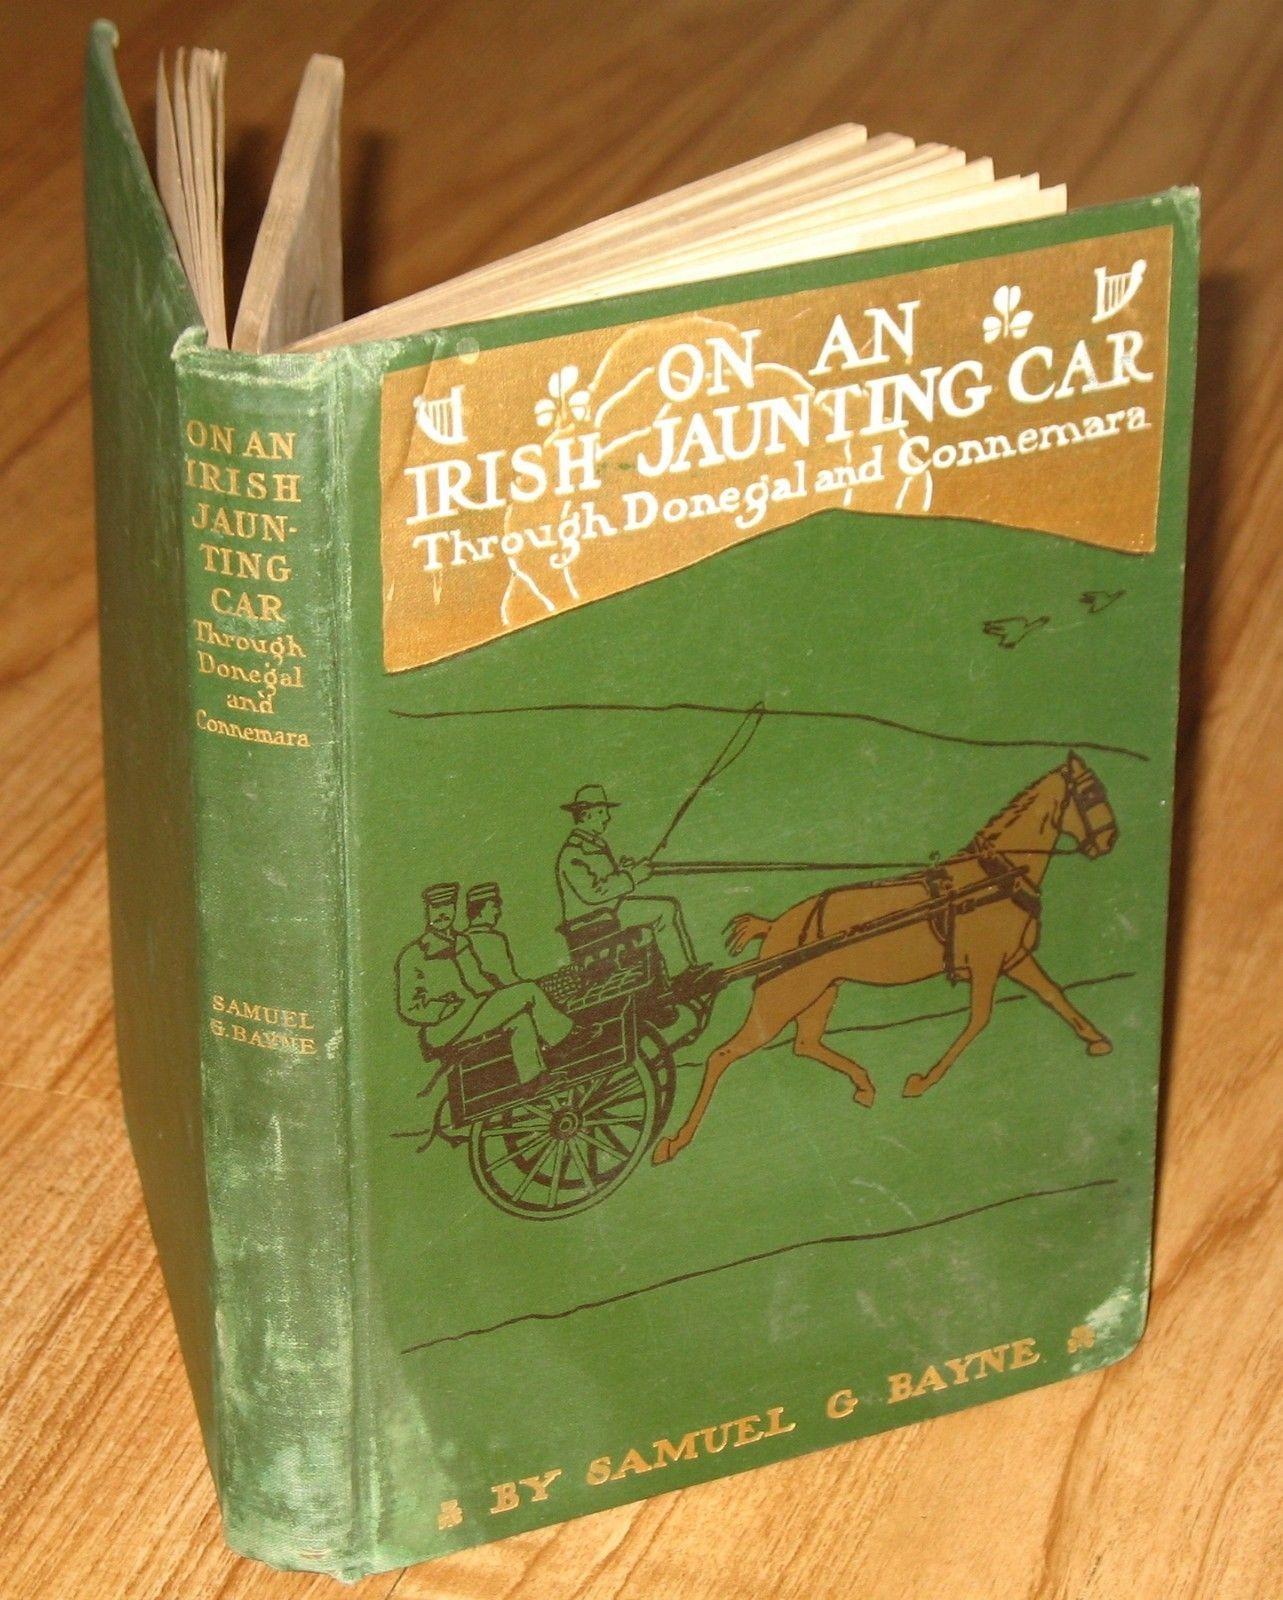 1902 on An Irish Jaunting Car Through Donegal Connemara 1st Edition s G Bayne | eBay